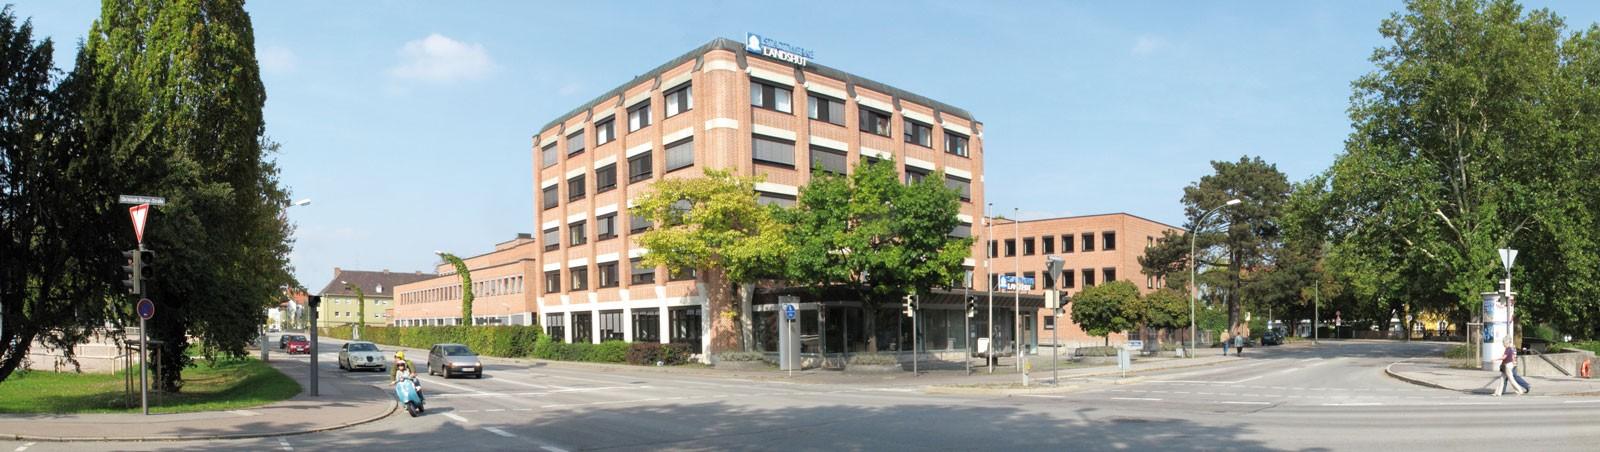 Zentrale Stadtwerke Landshut